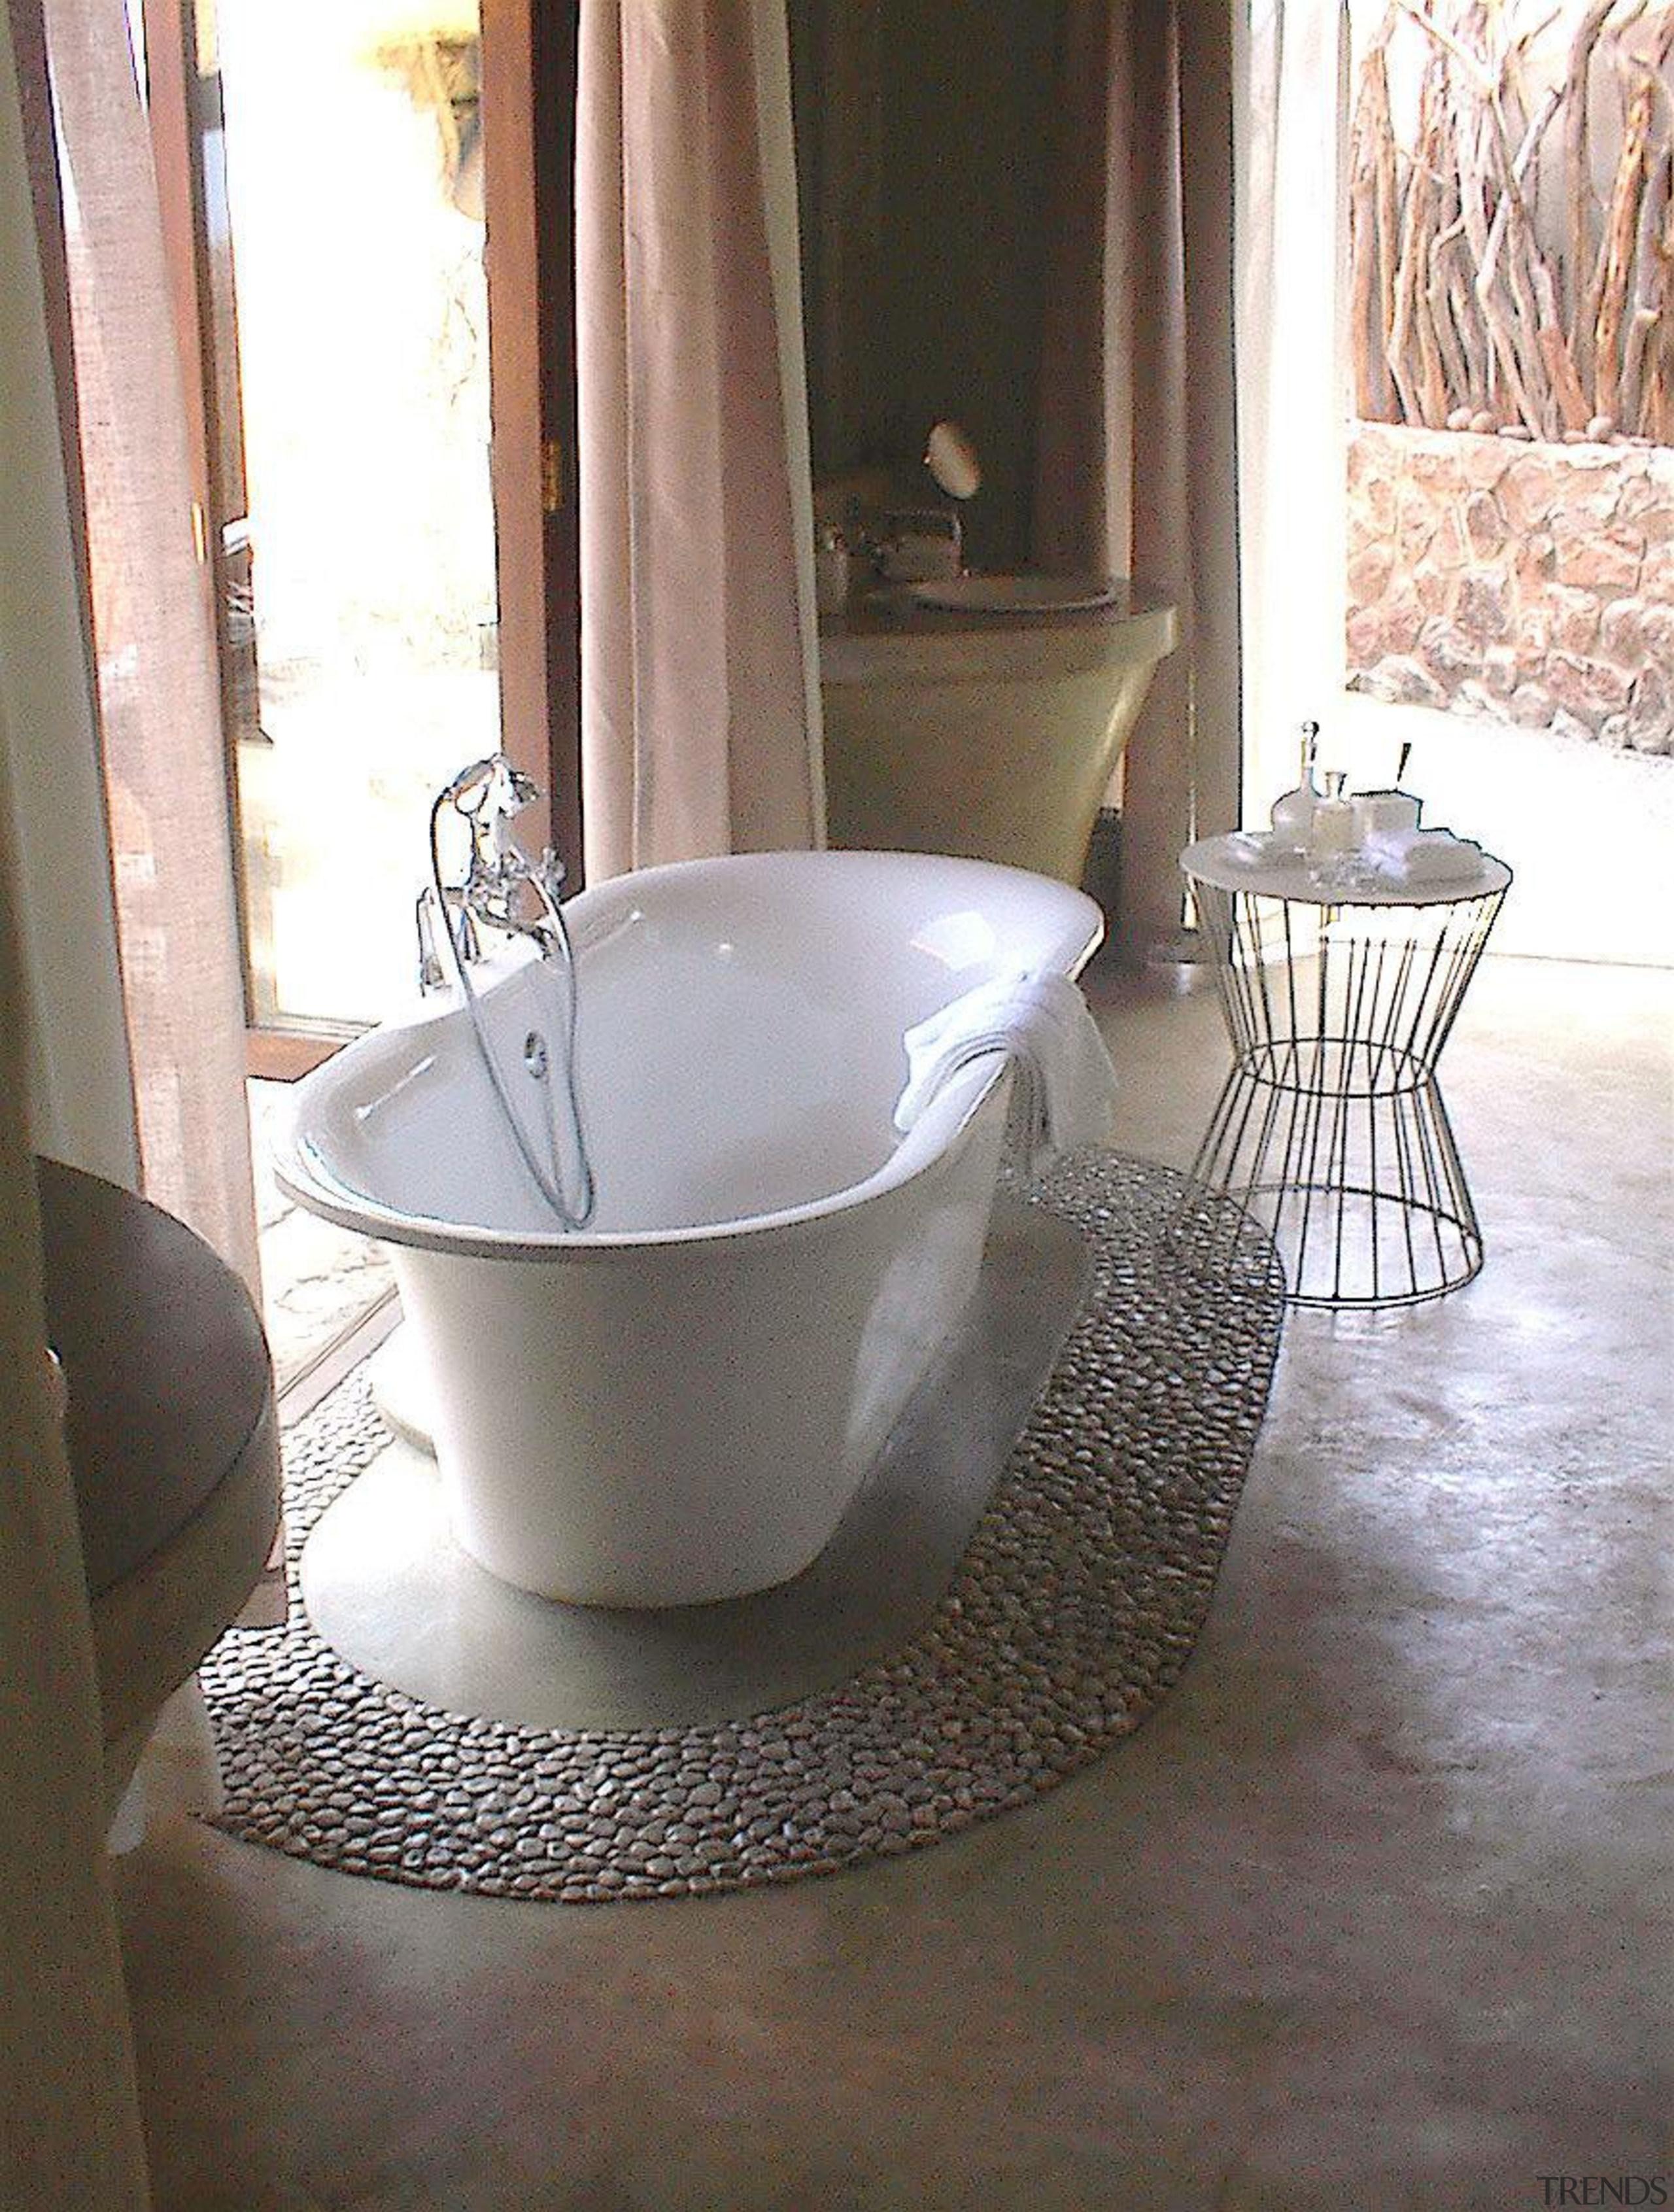 Micro topping 16 - Micro_topping_16 - bathroom   bathroom, ceramic, plumbing fixture, sink, tap, gray, white